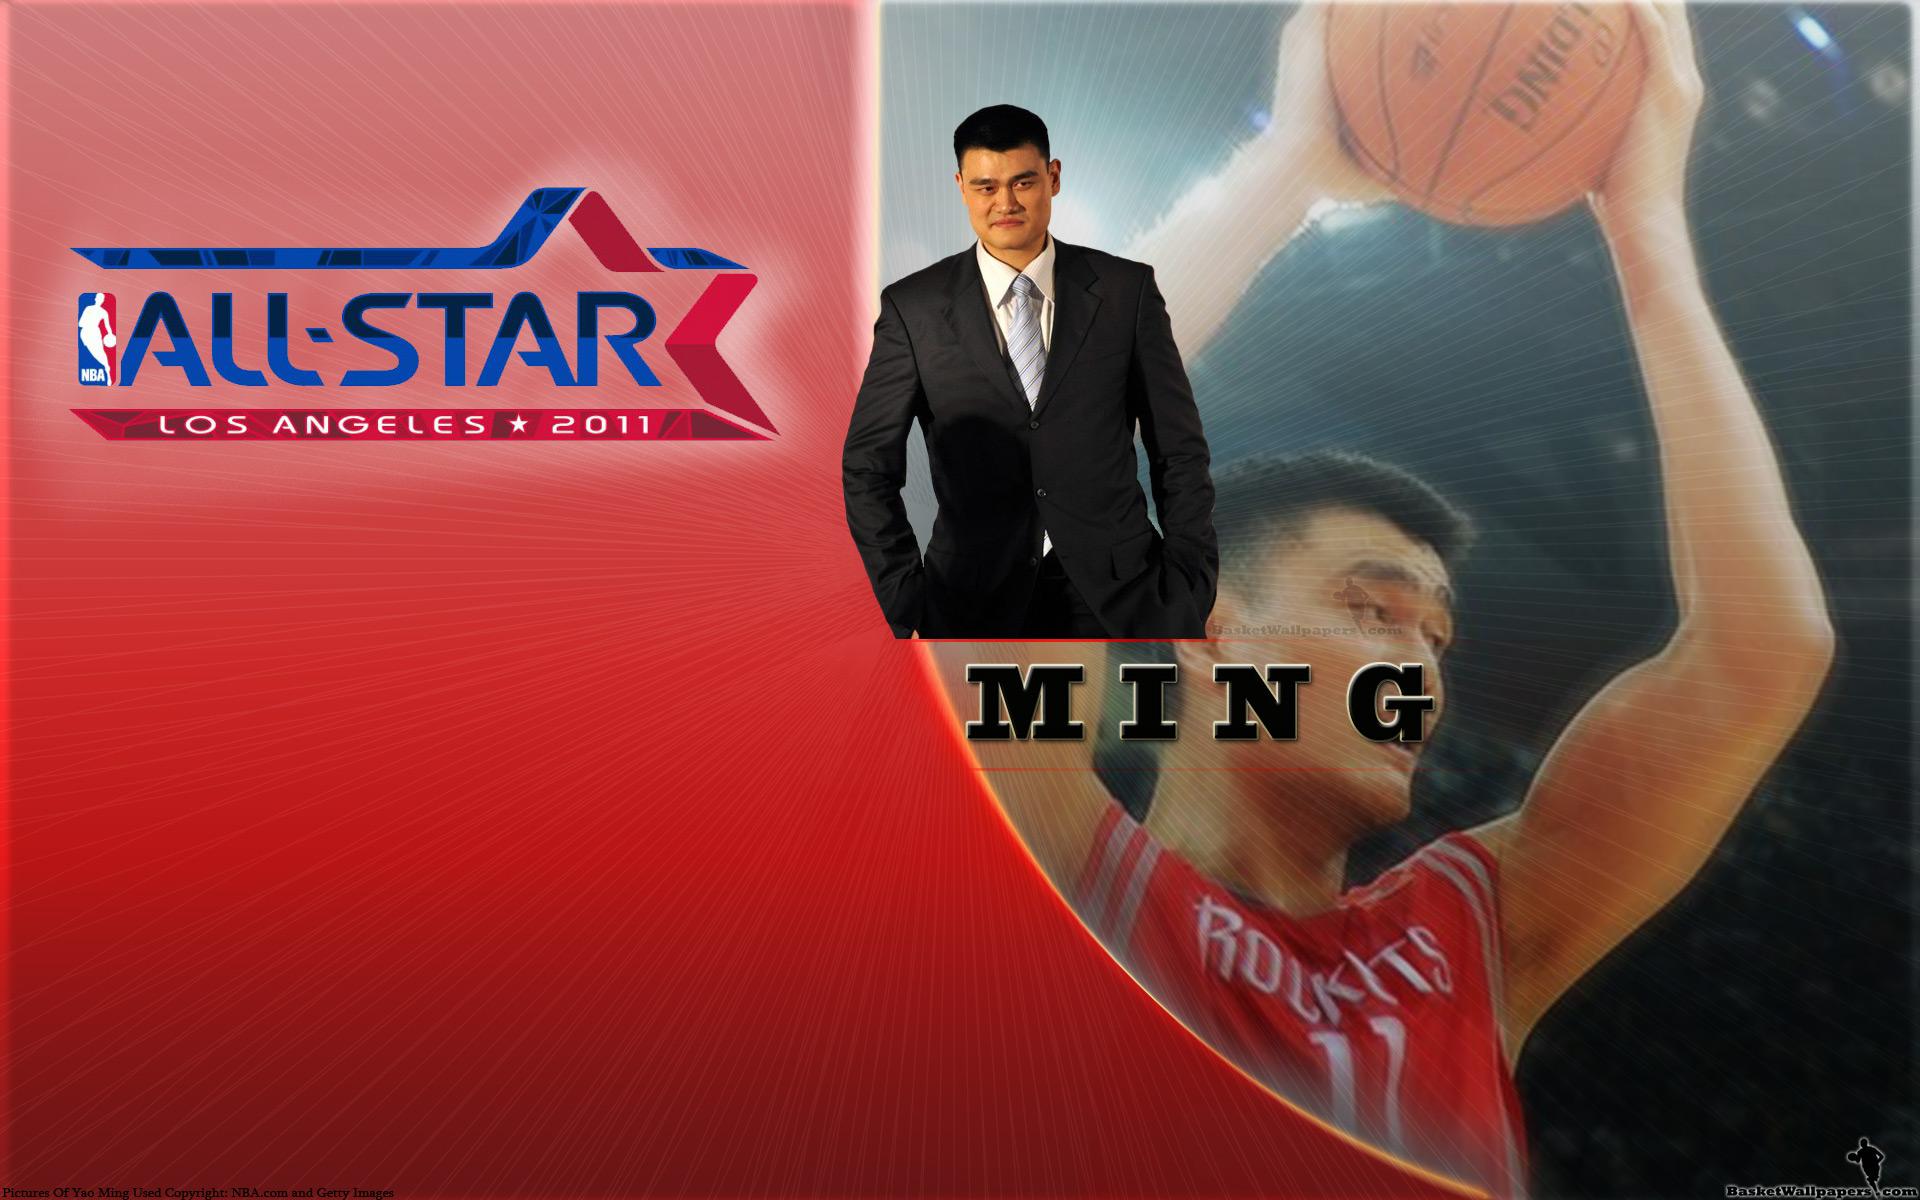 Yao Ming 2011 All-star Widescreen Wallpaper - Nba All Star Game 2011 , HD Wallpaper & Backgrounds